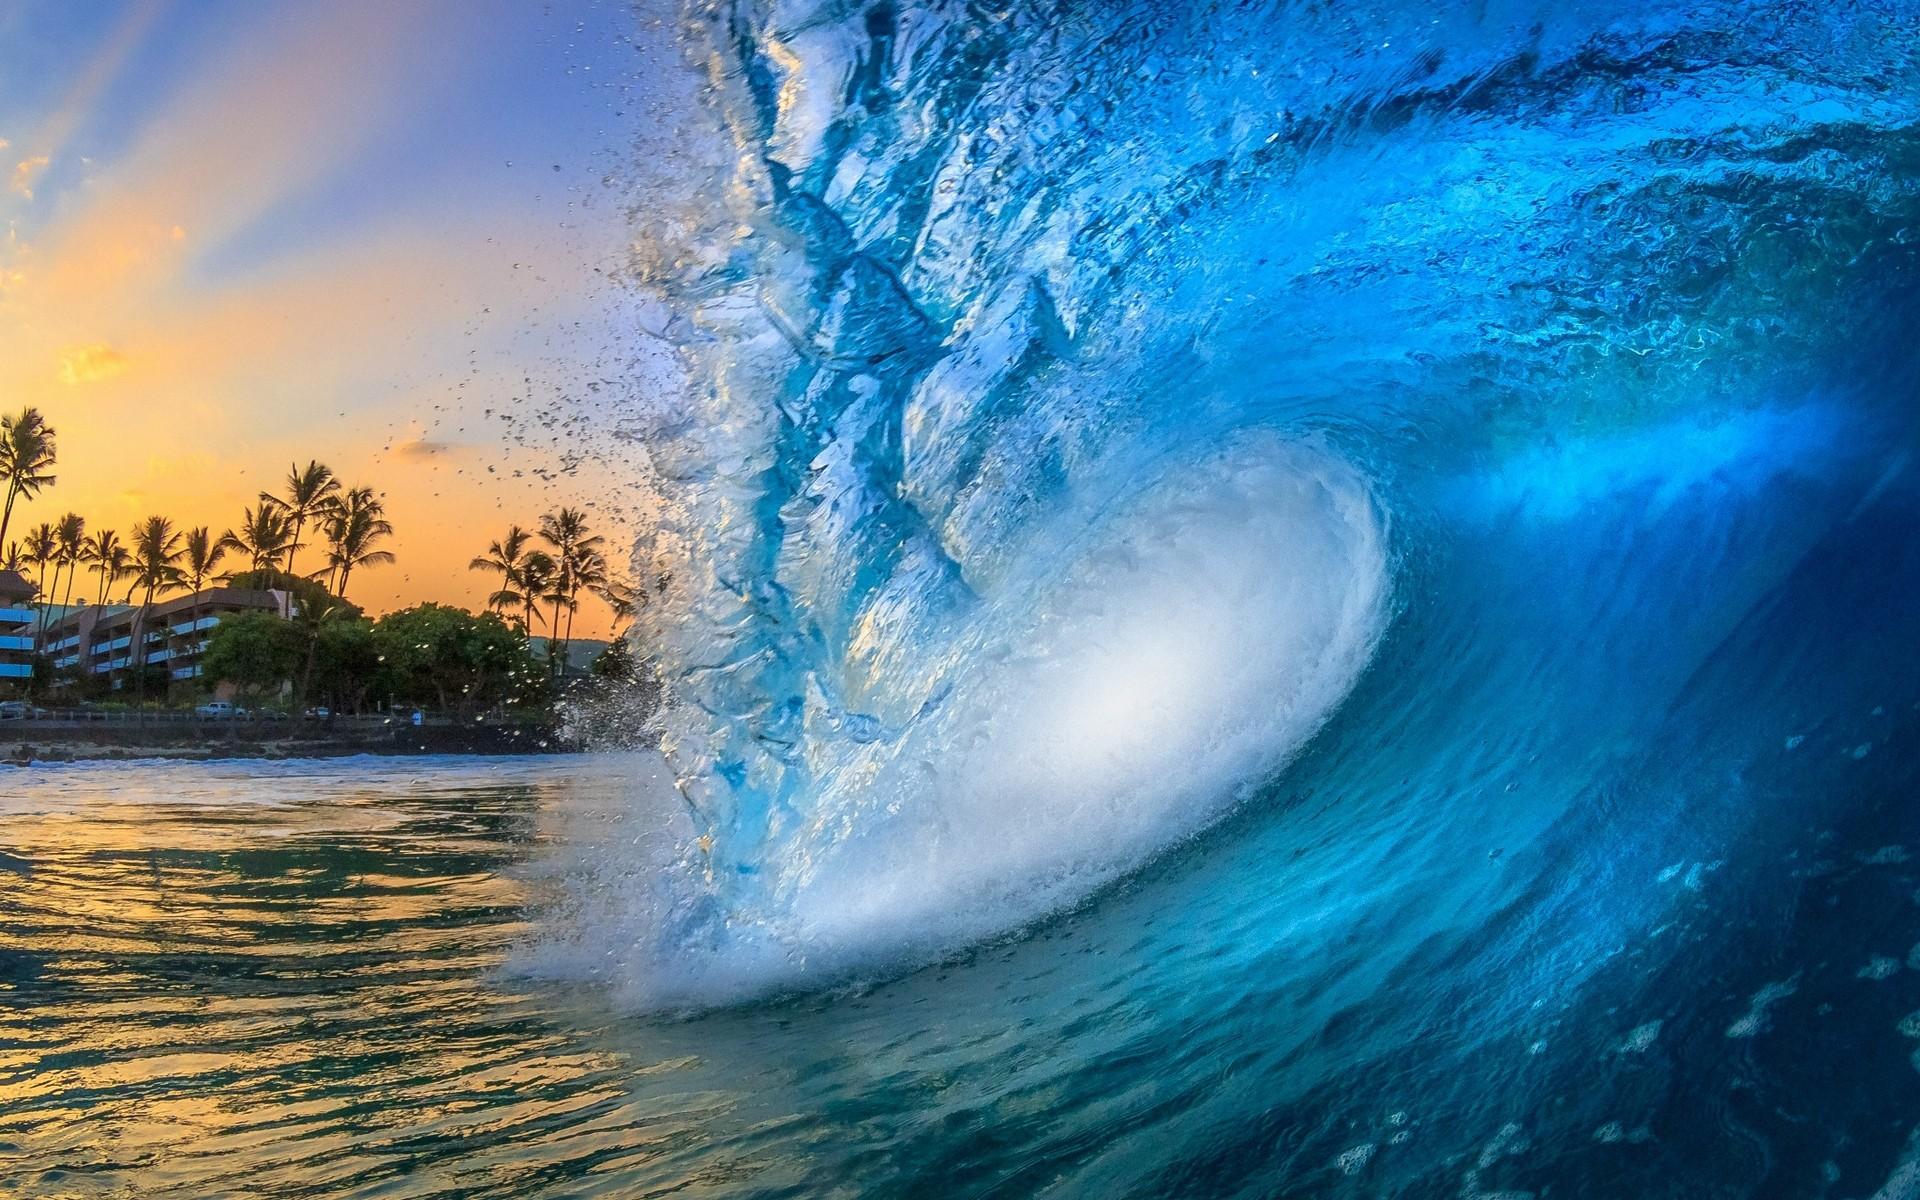 Top 10 Hawaii Beach Safety Tips - BEAT OF HAWAII Ocean wave pictures hawaii